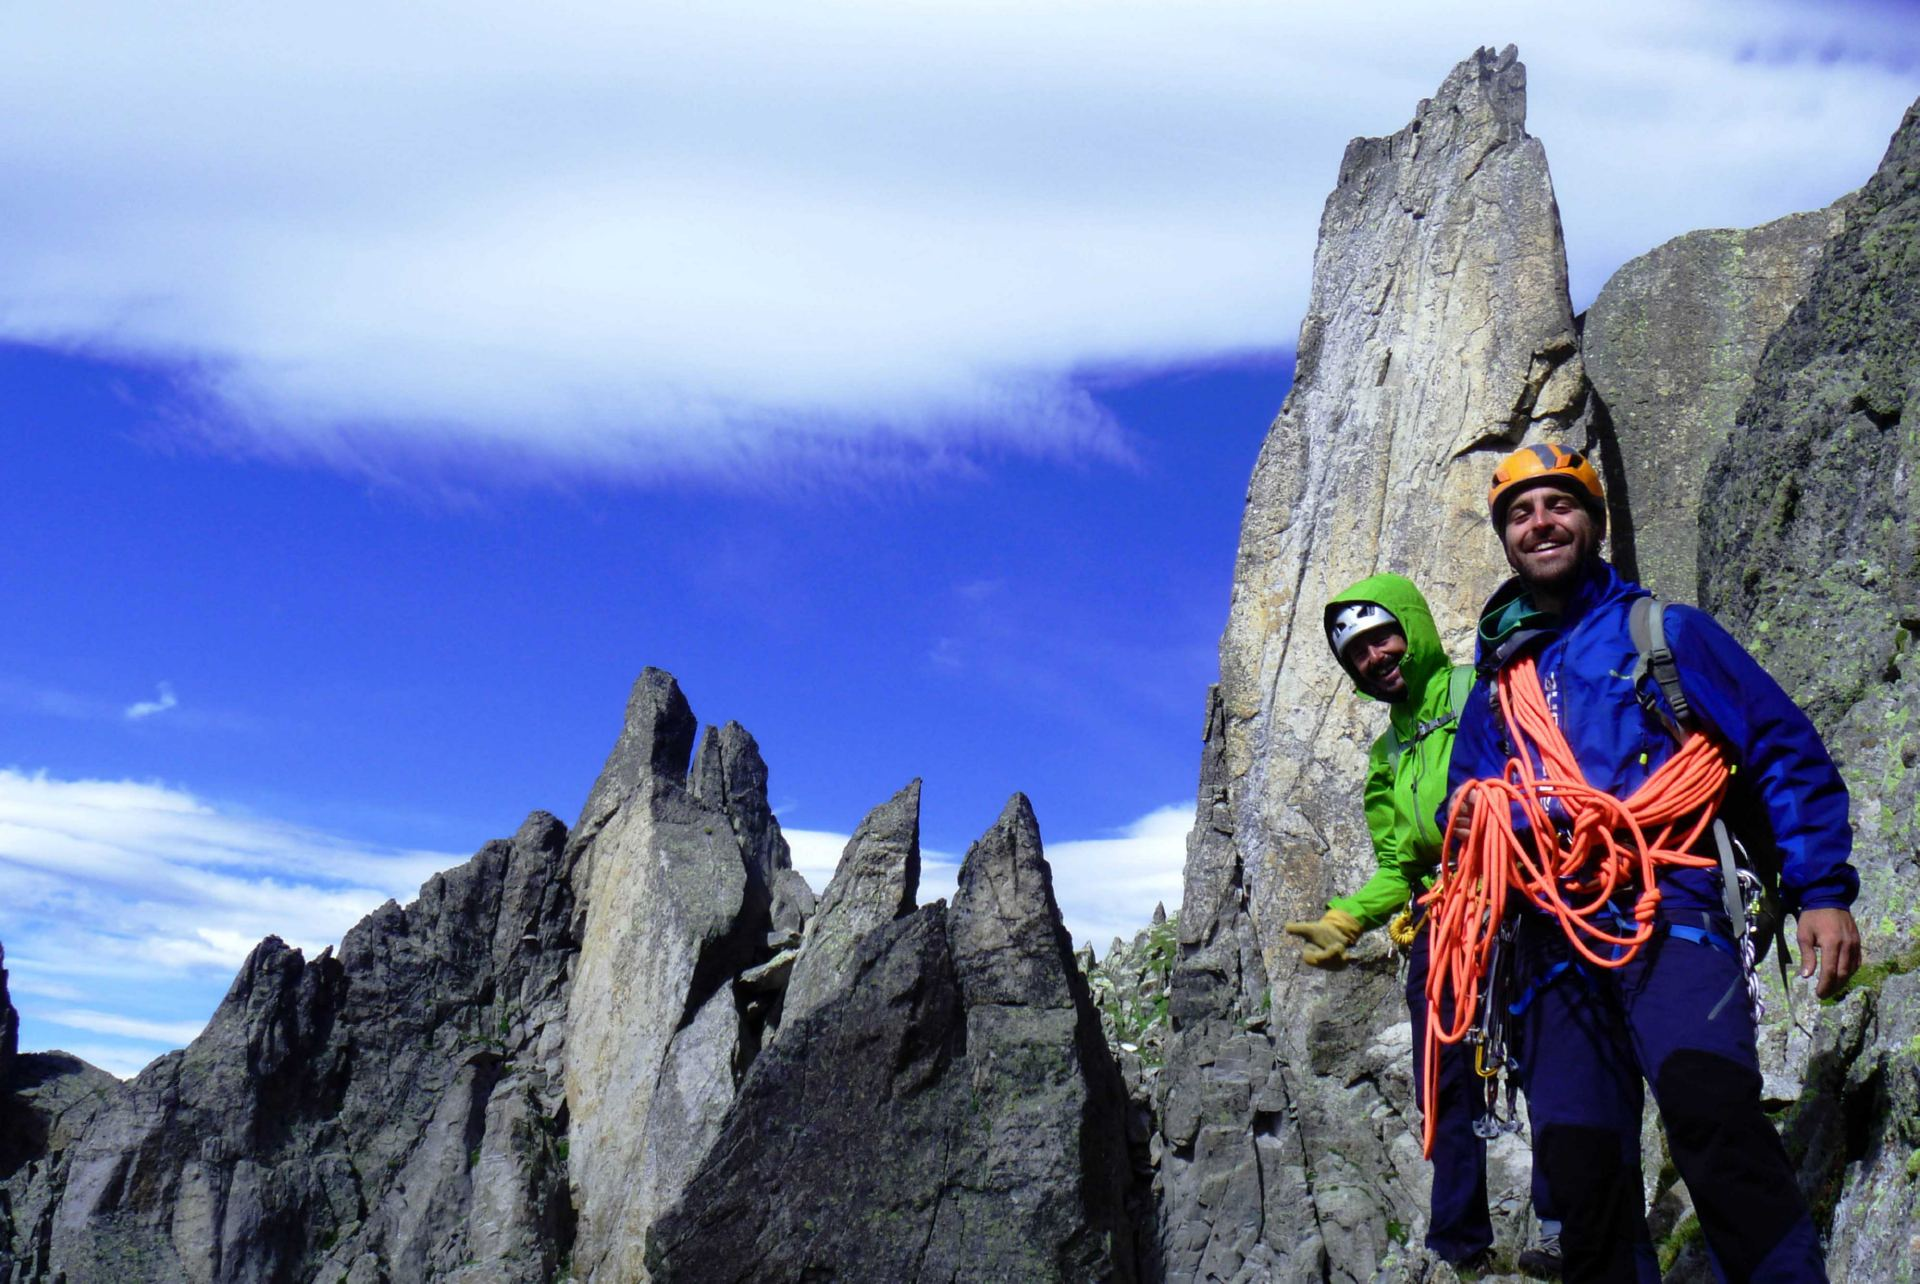 Arista/ridge Roger Mountain Guide